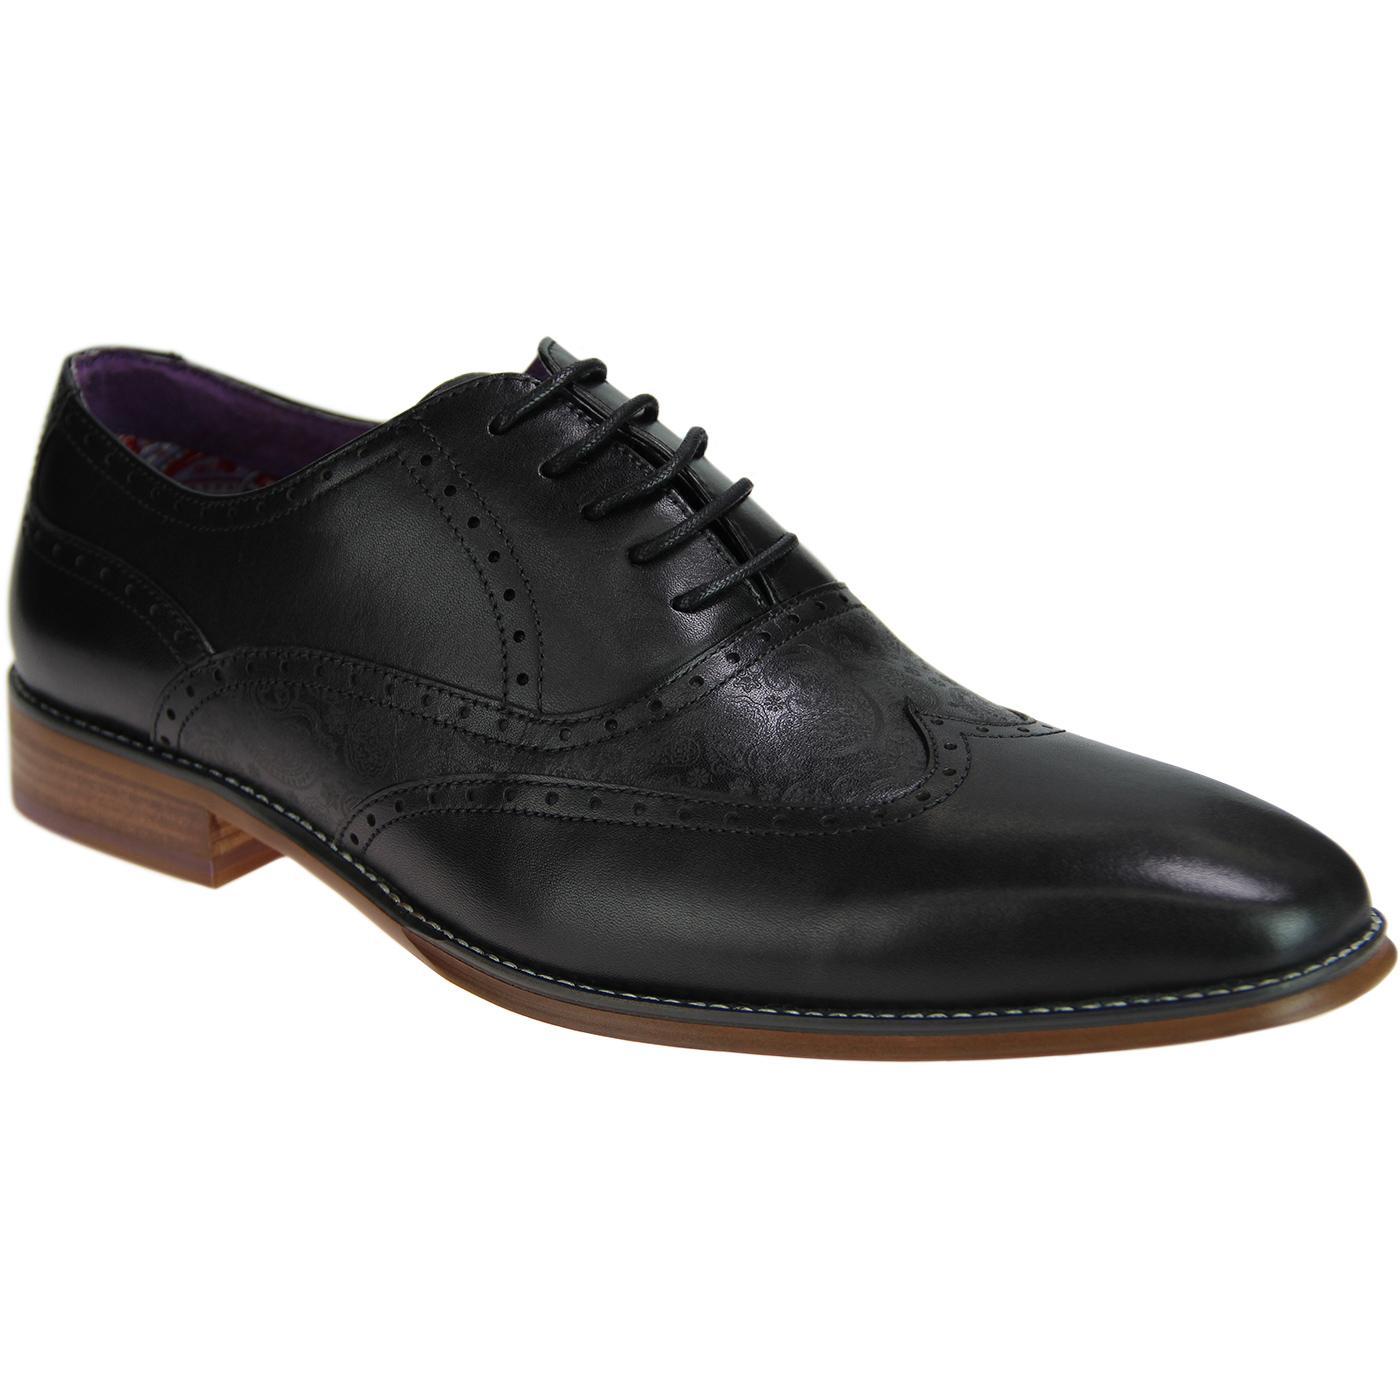 Daxon PAOLO VANDINI Retro Mod Paisley Oxford shoes